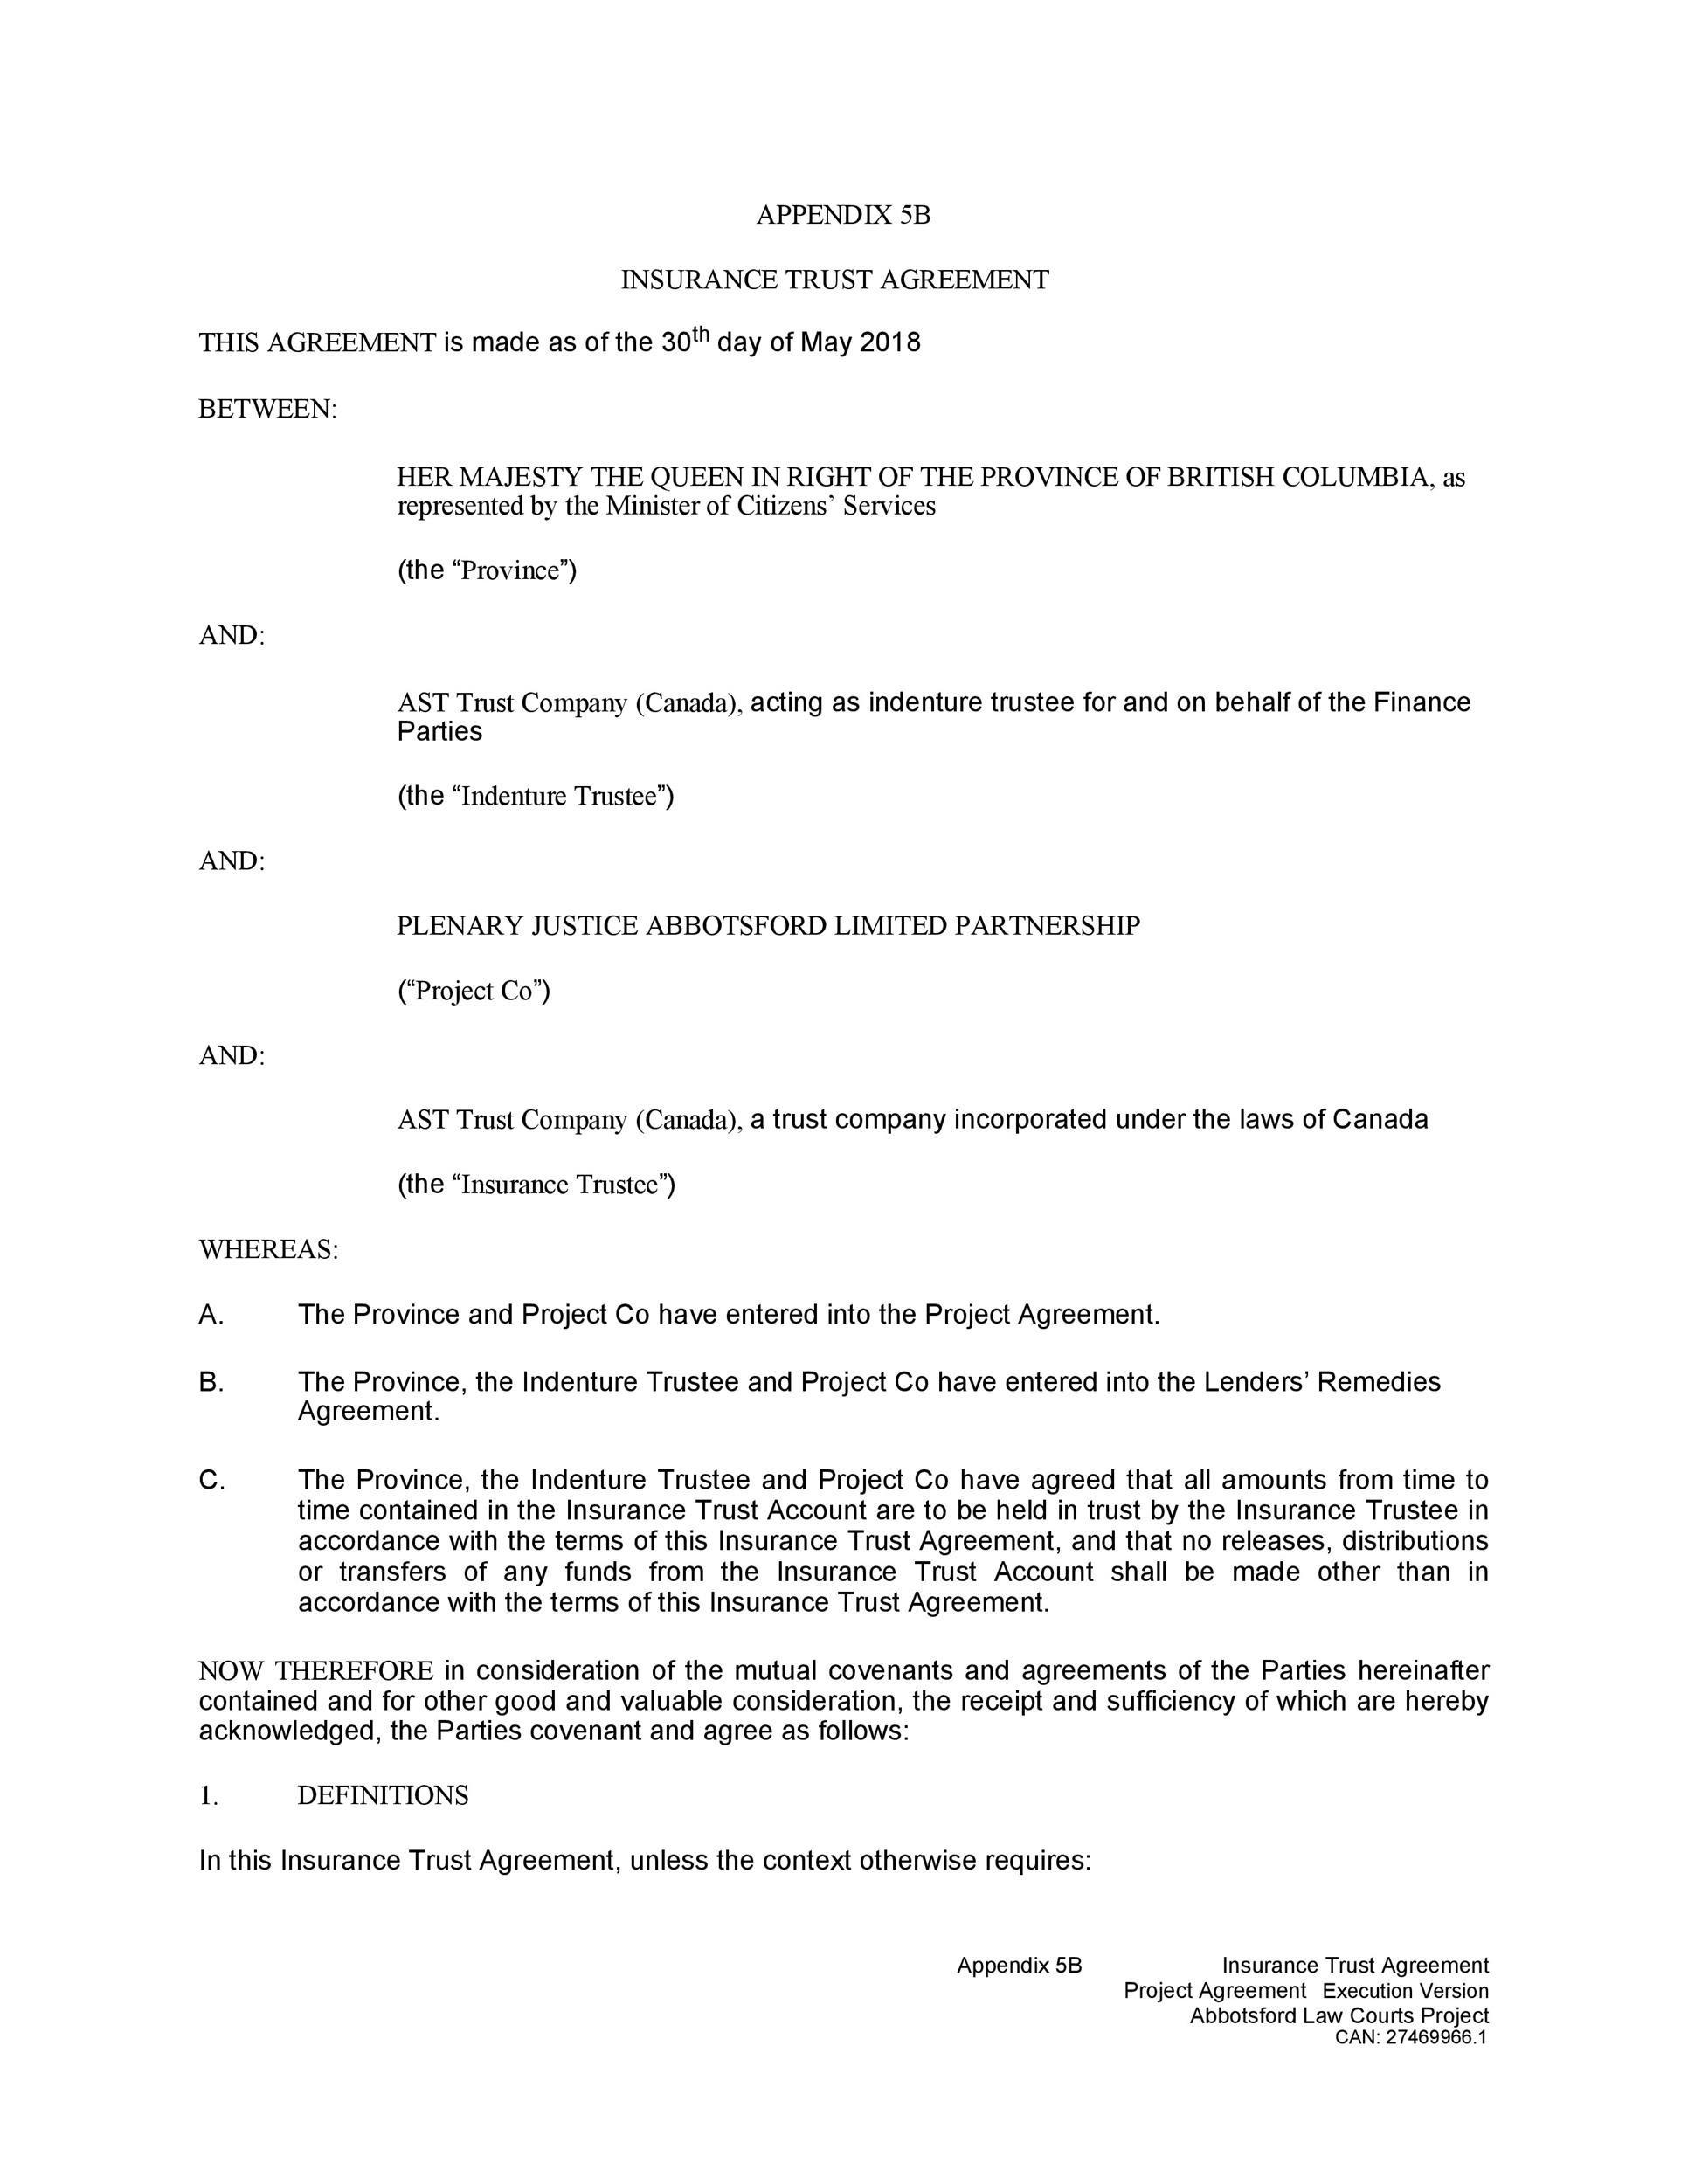 Free trust agreement 12